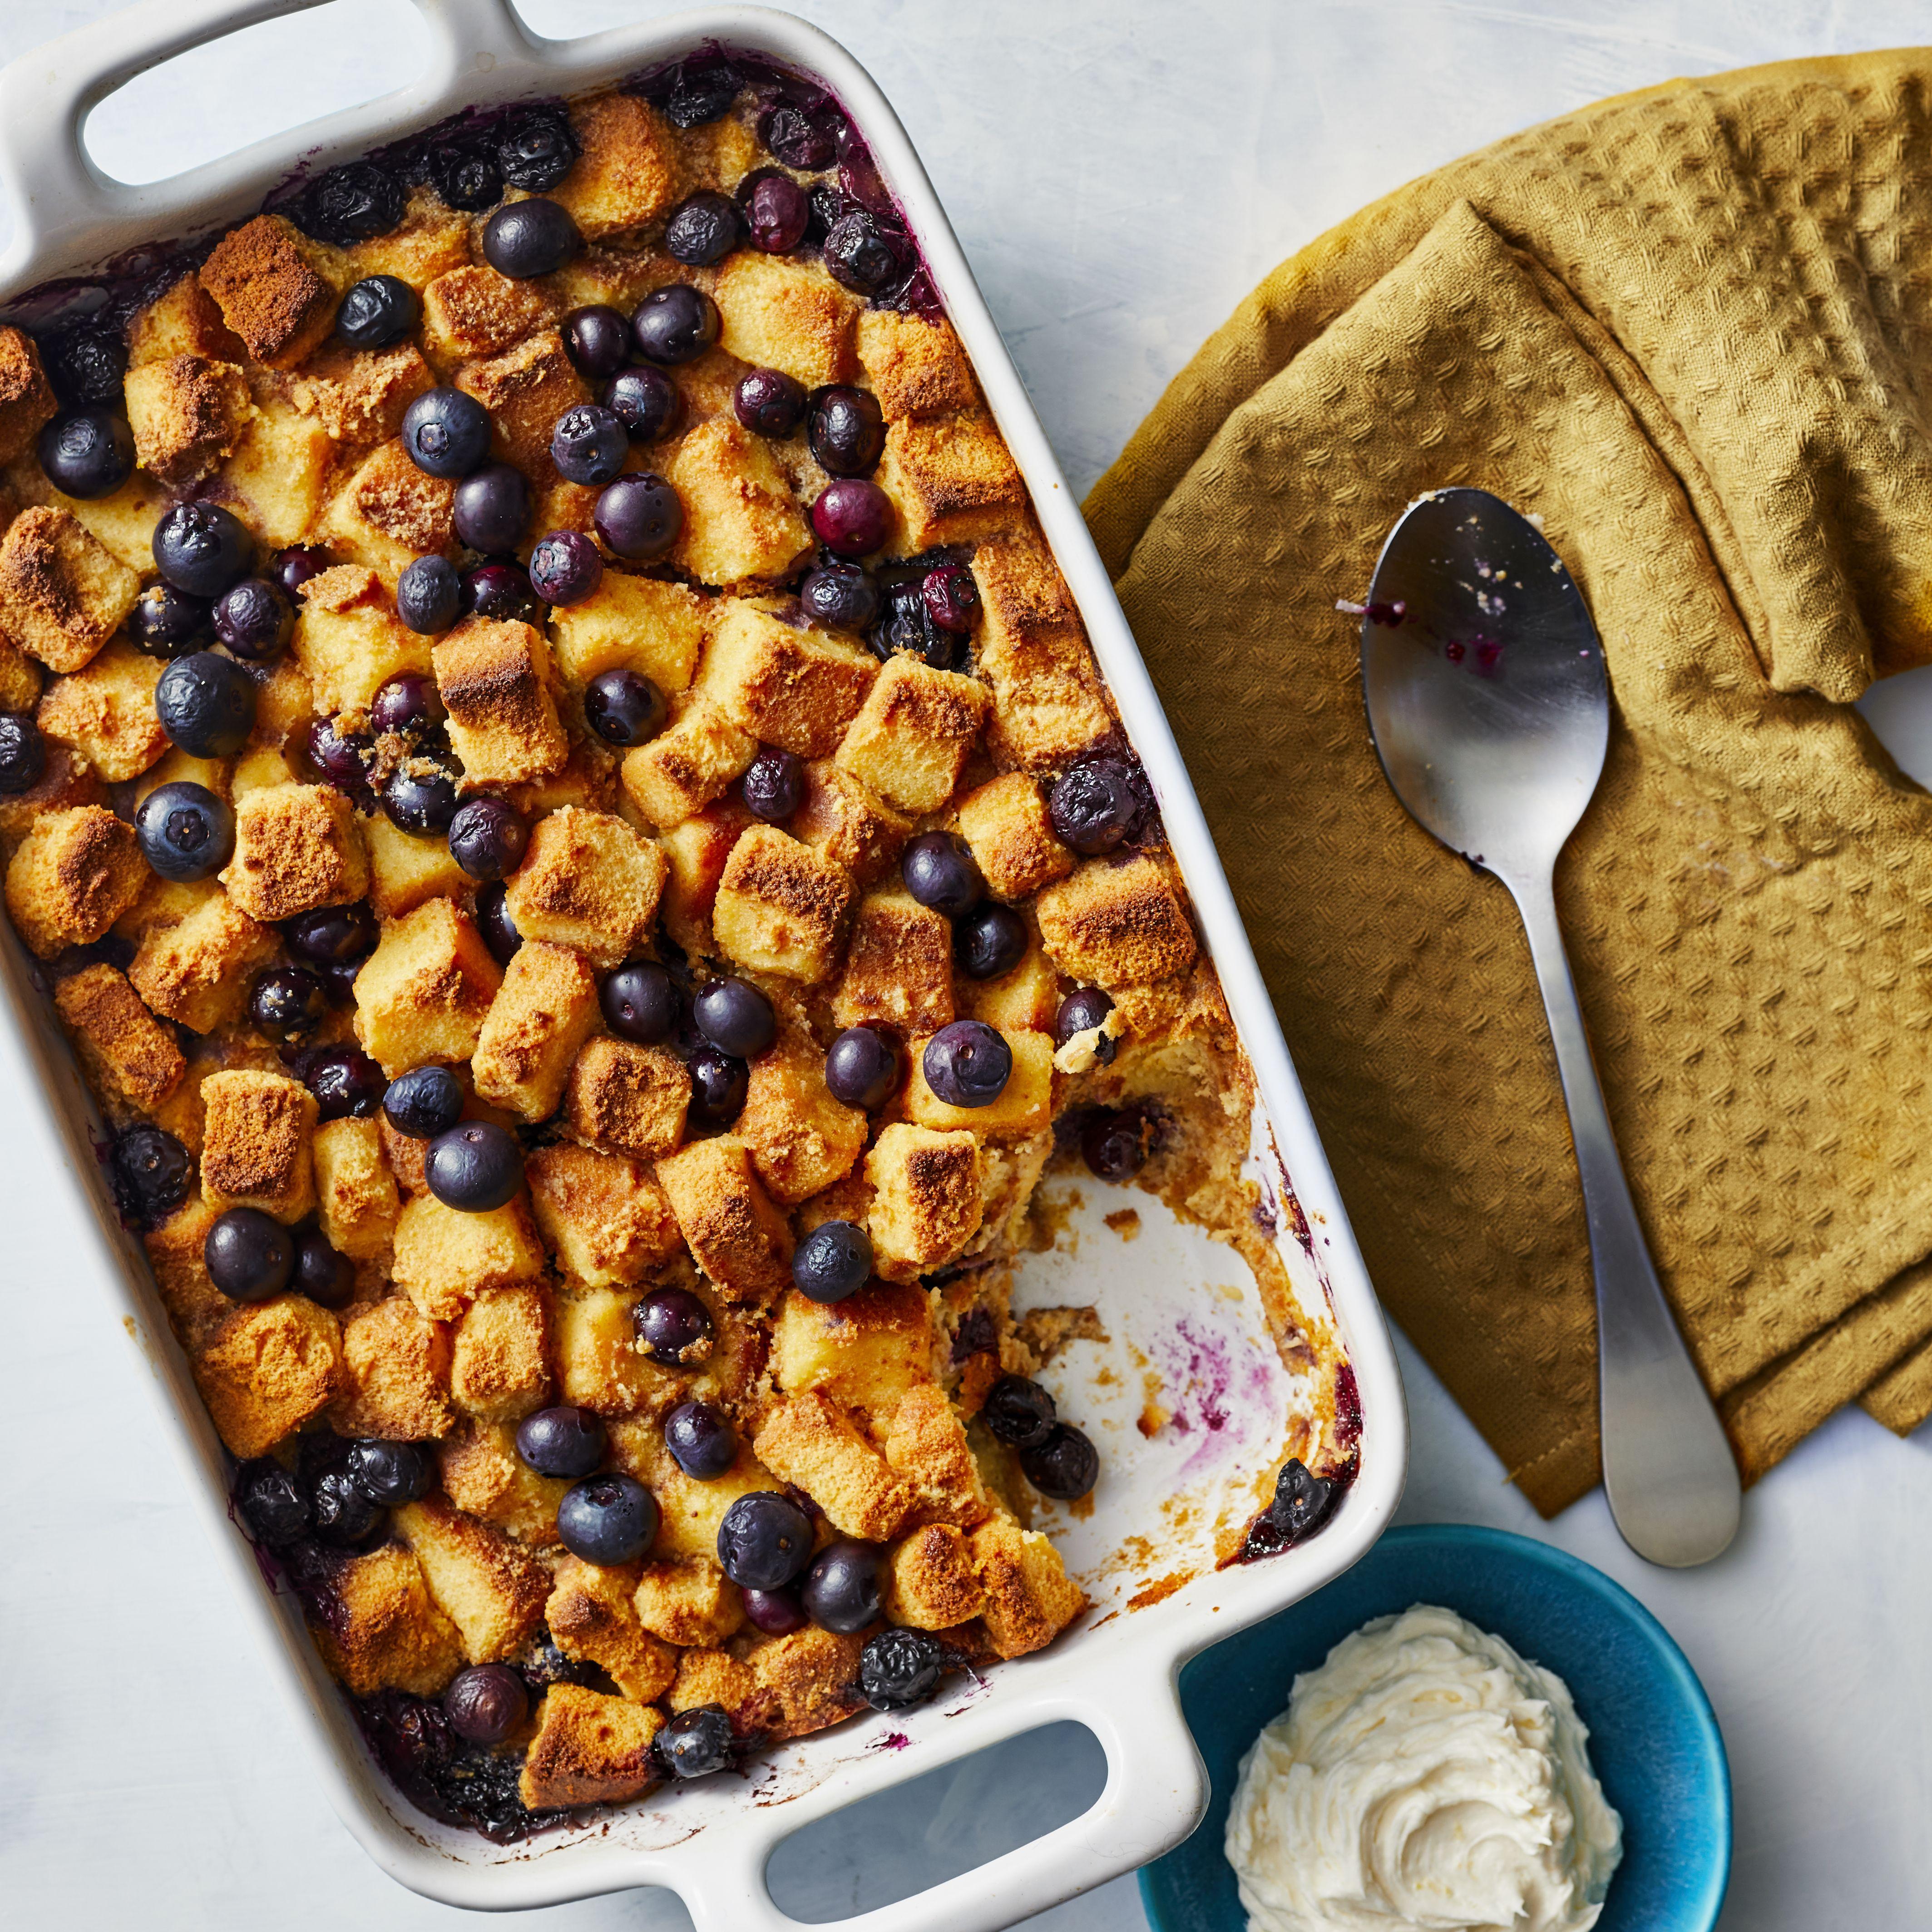 Blueberry bread pudding with lemon hard sauce recipe